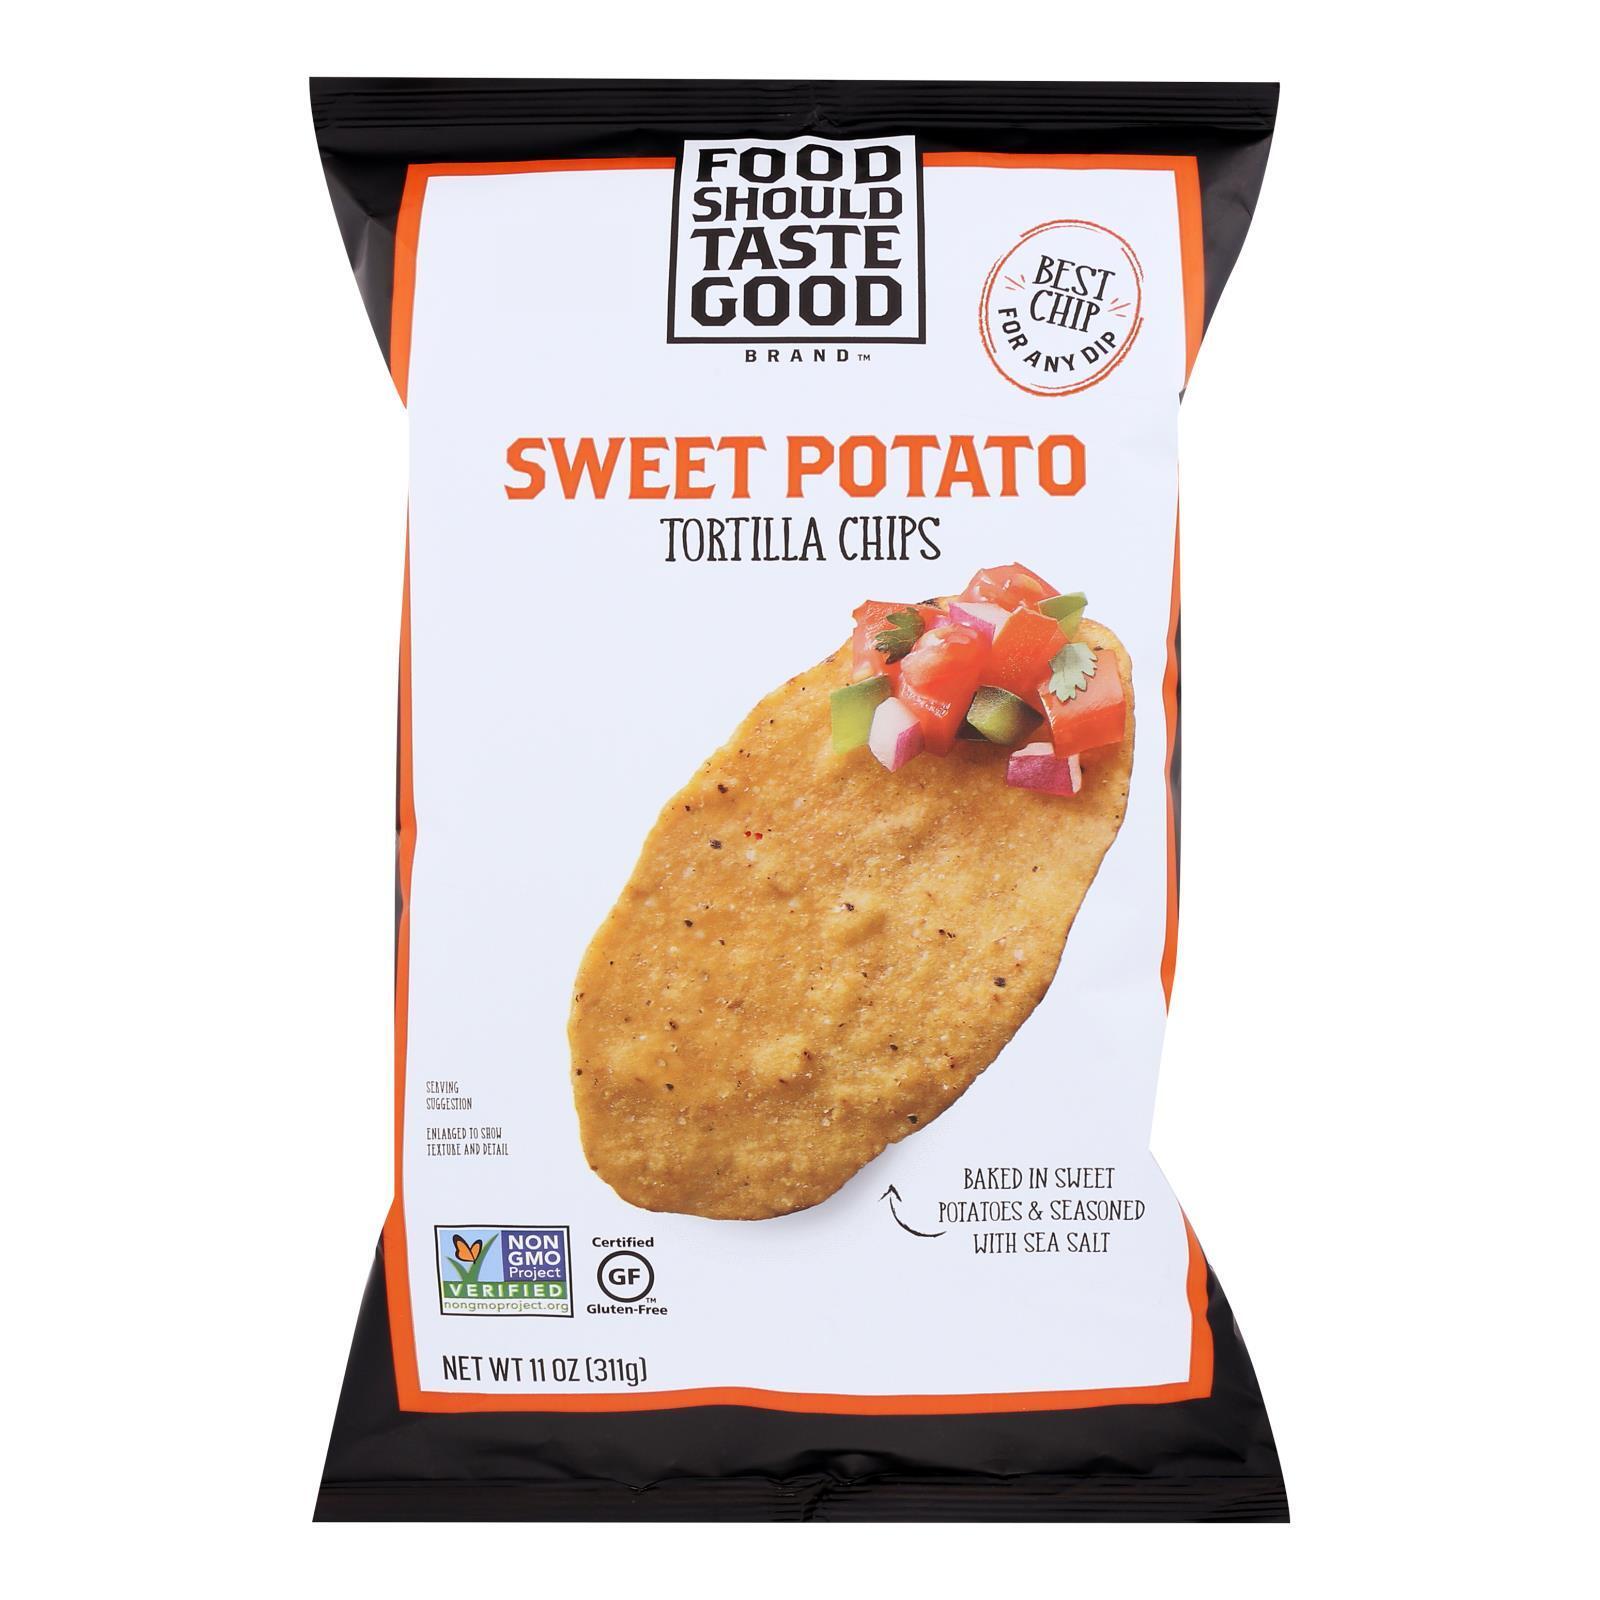 Food Should Taste Good Sweet Potato Tortilla Chips - Sweet Potato - Case of 12 - 11 oz.